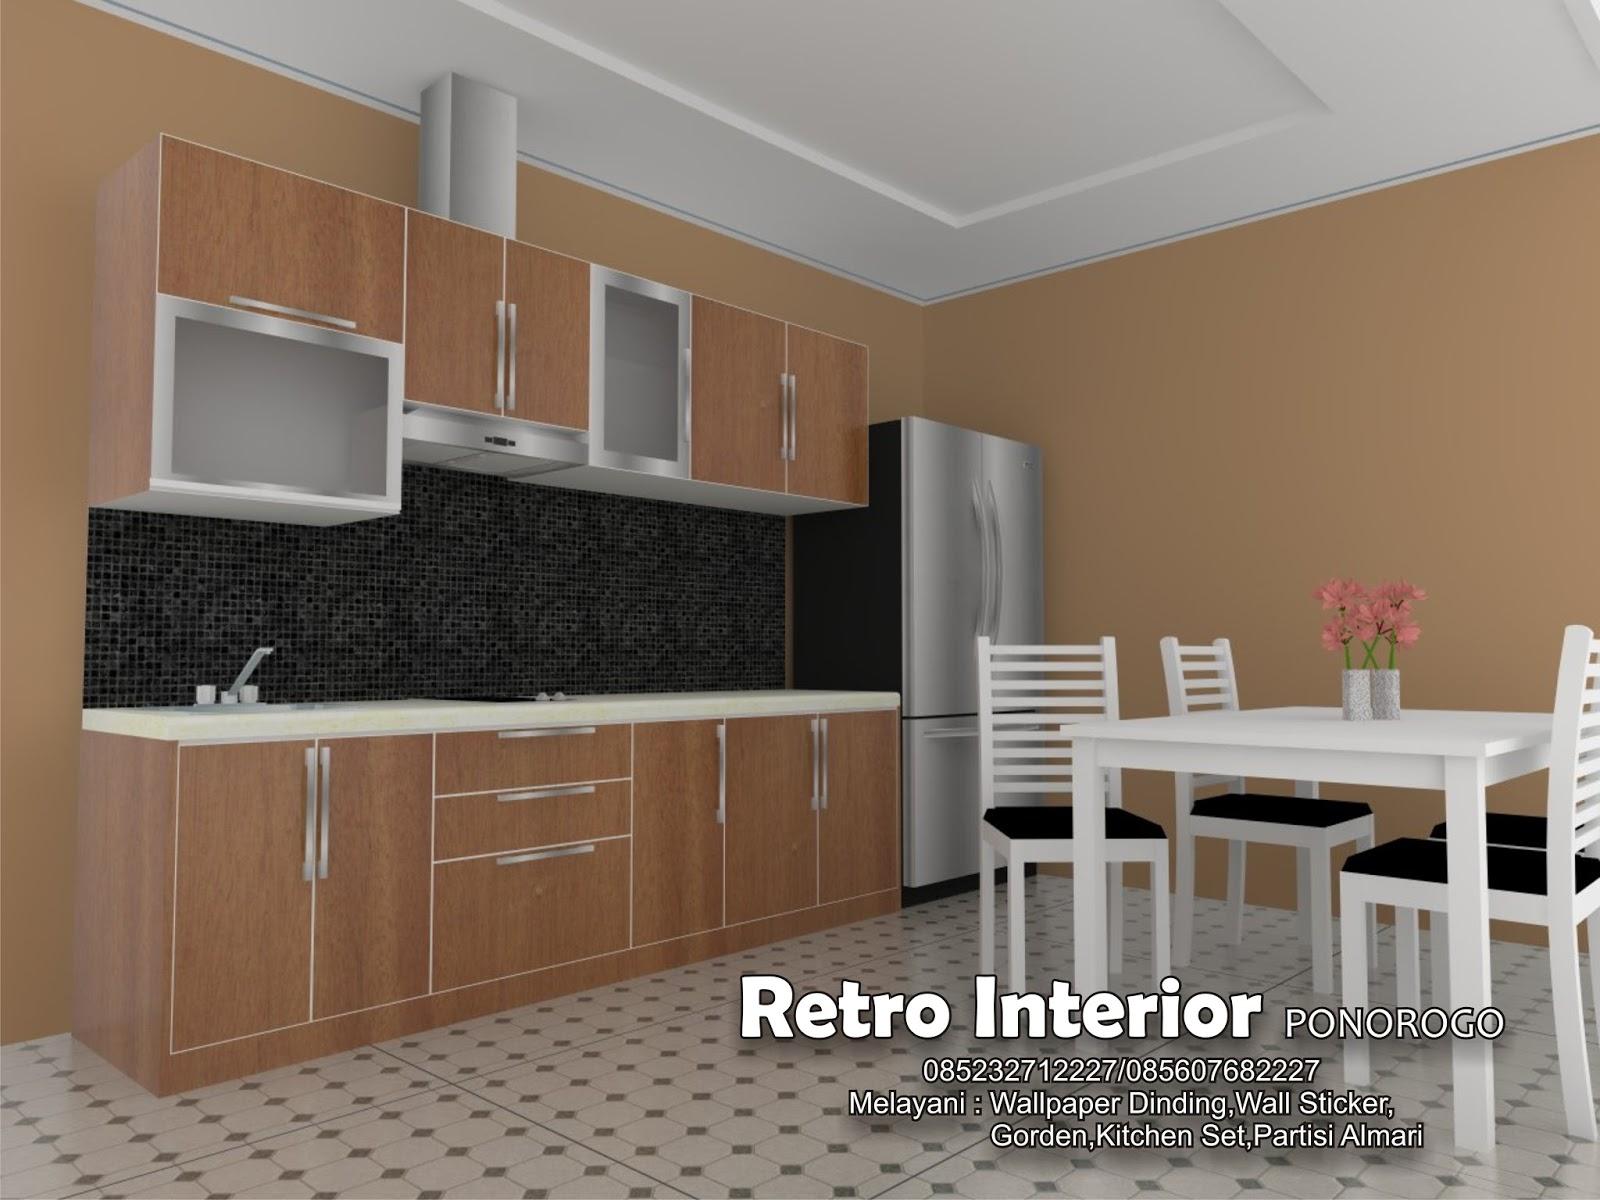 Inspirasi Desain Ruang Tamu Menyatu Dengan Dapur Masa Kini